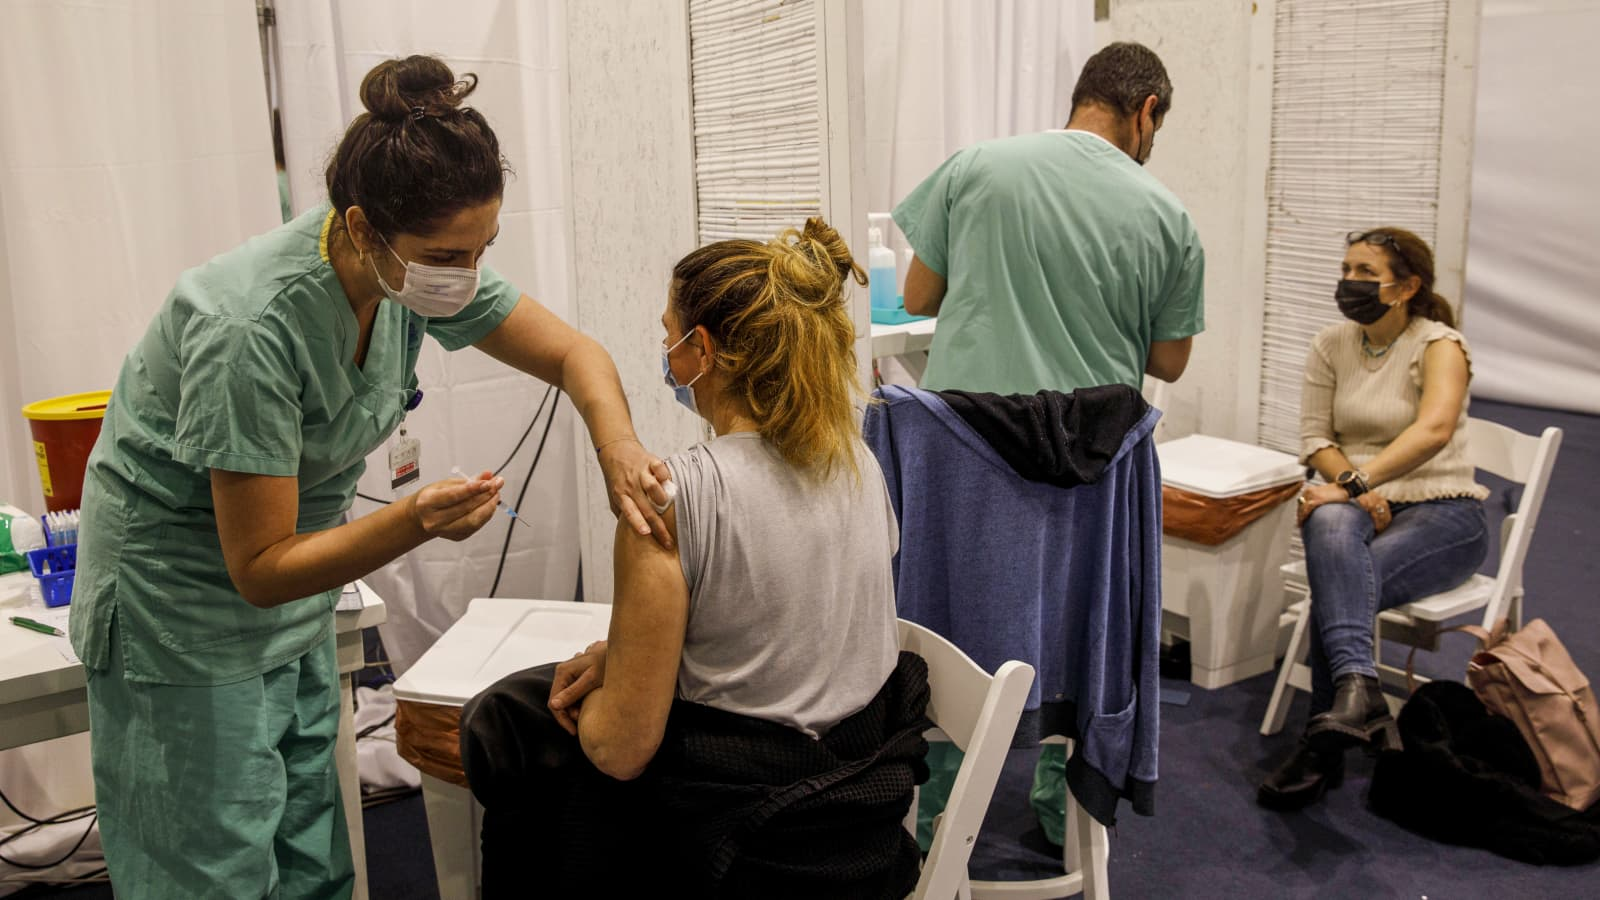 Covid Pfizer vaccine: Israel study finds 94% drop in symptomatic cases